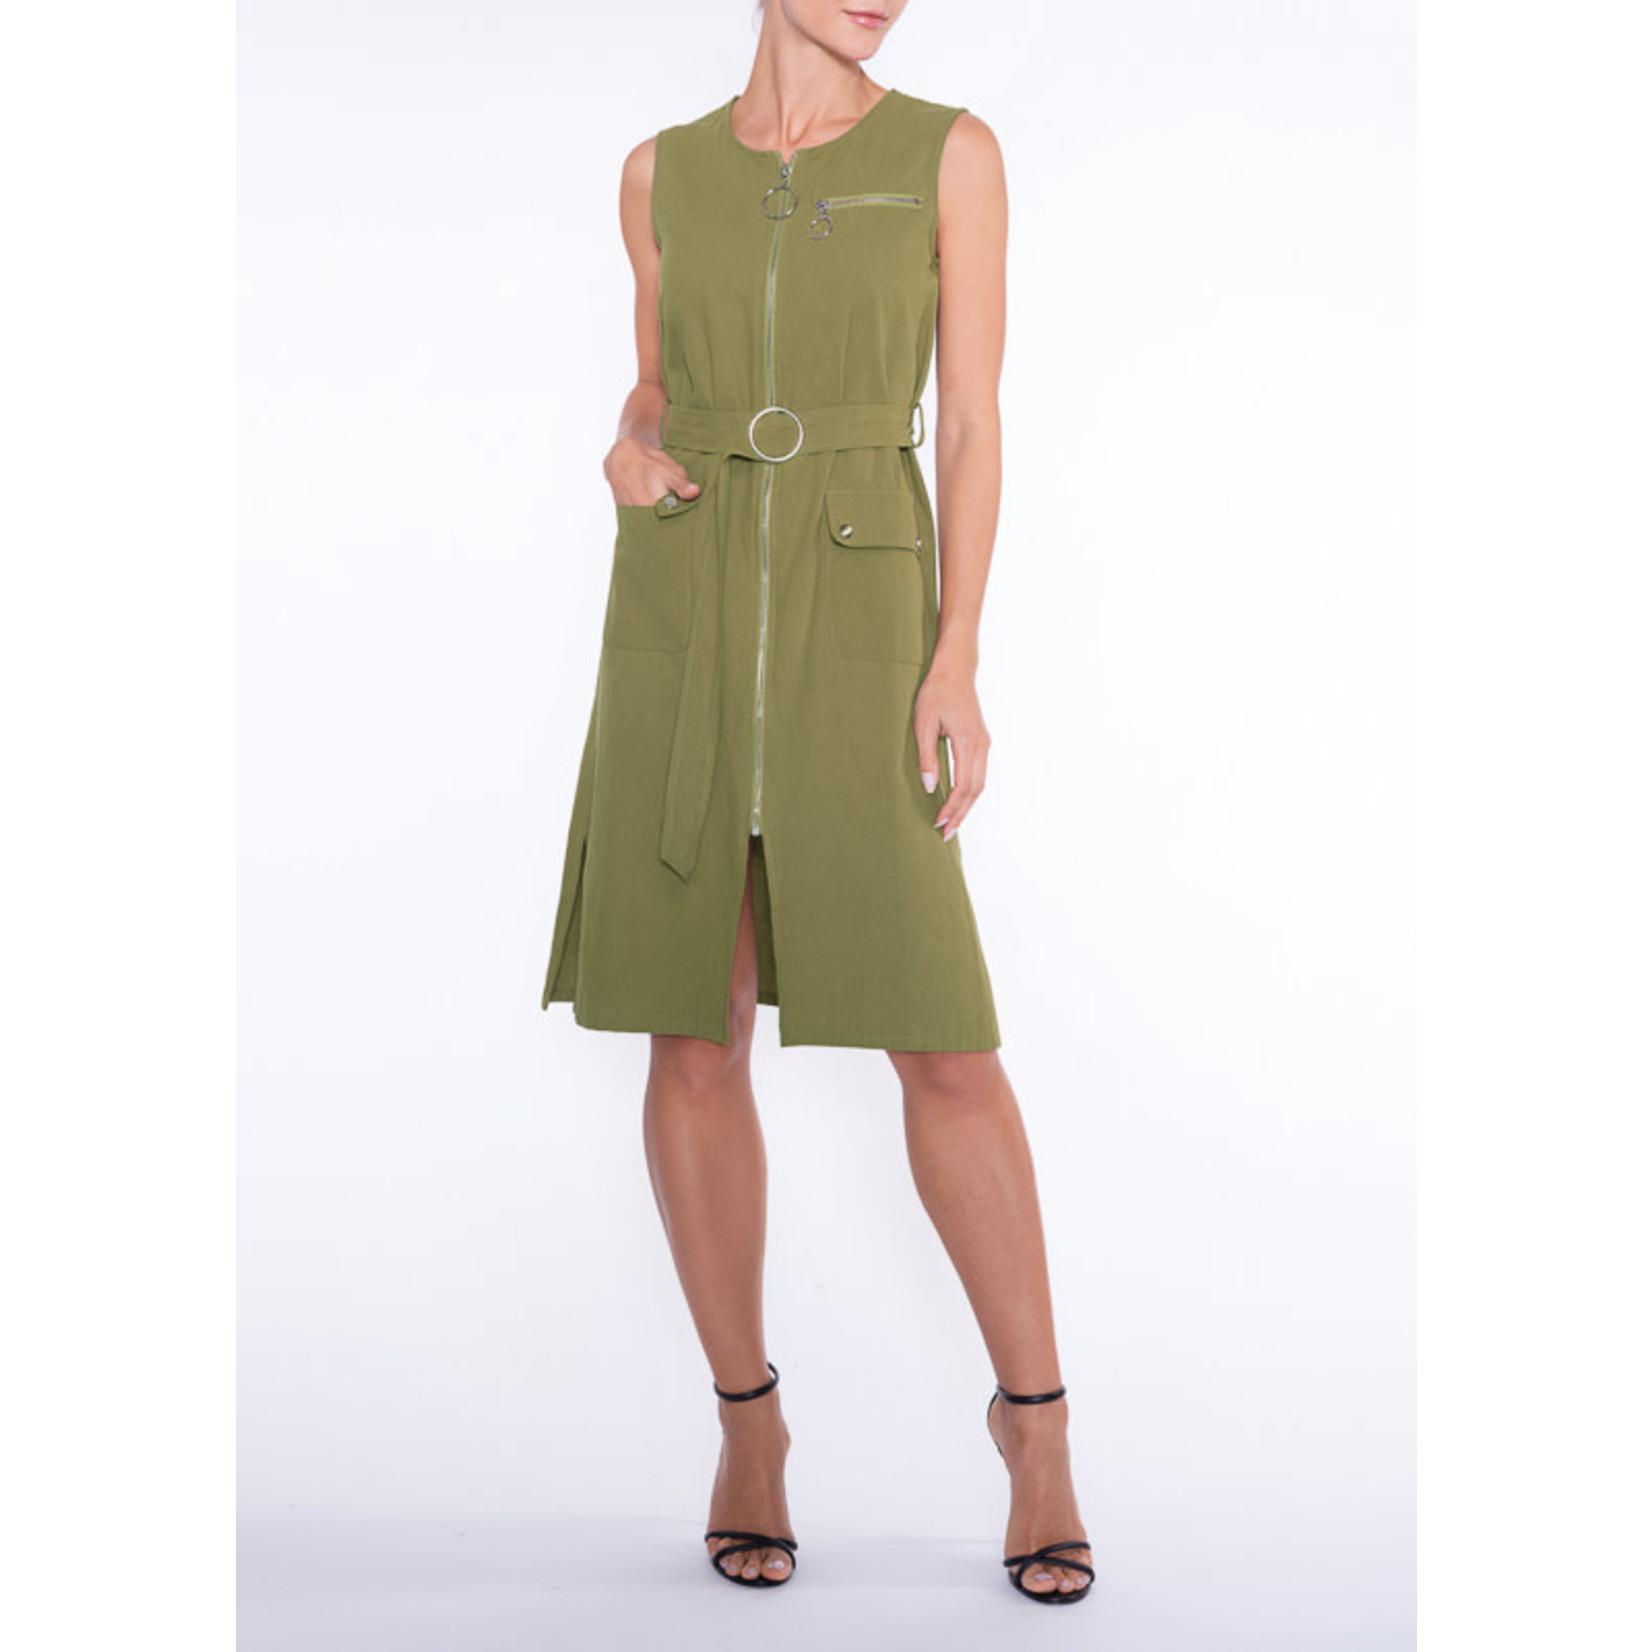 Khaki ZipUp Dress w/ Front Pockets